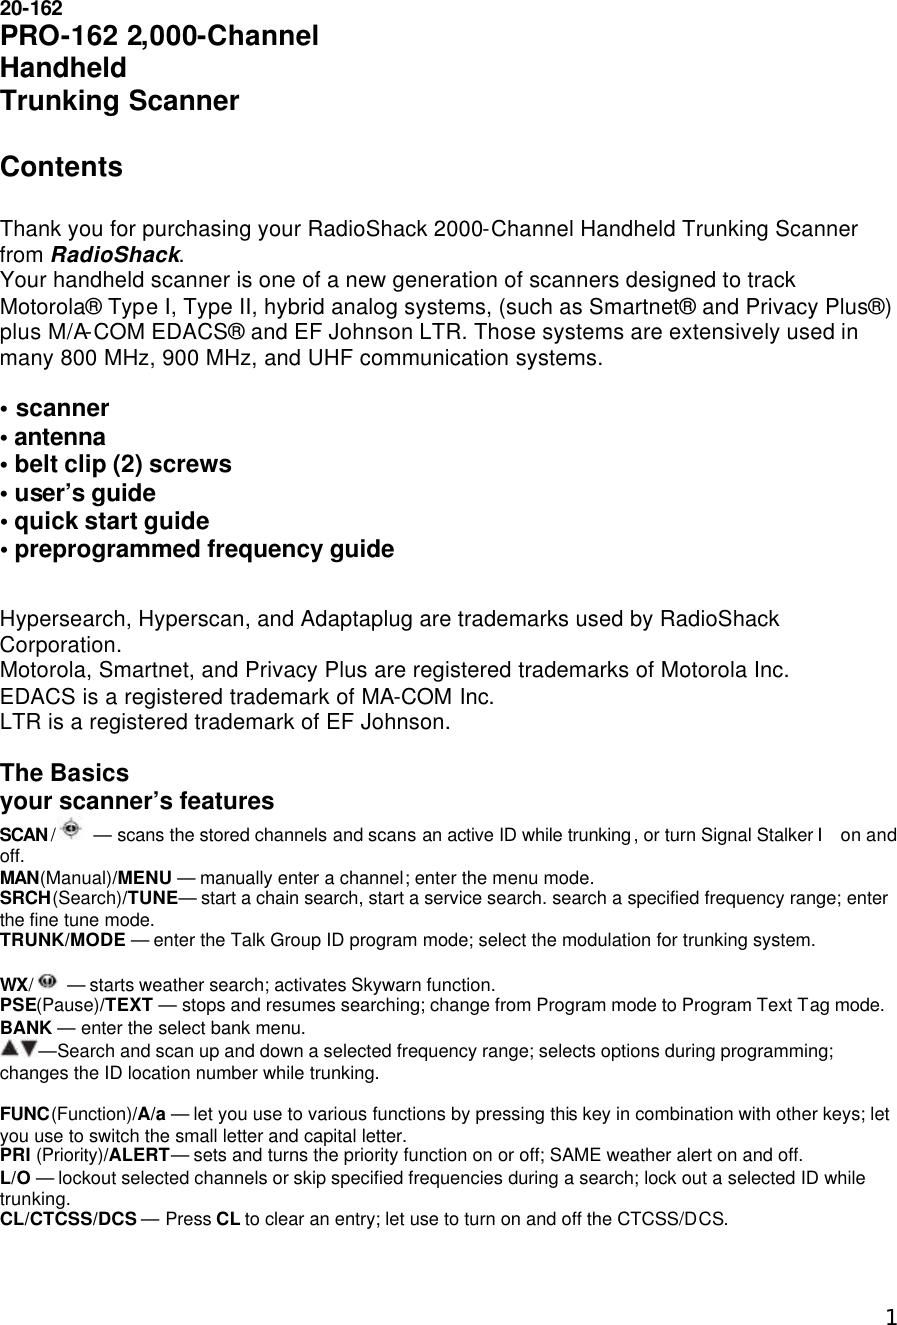 Uniden America Ub350 Handheld Scanner User Manual Oml Amwub350